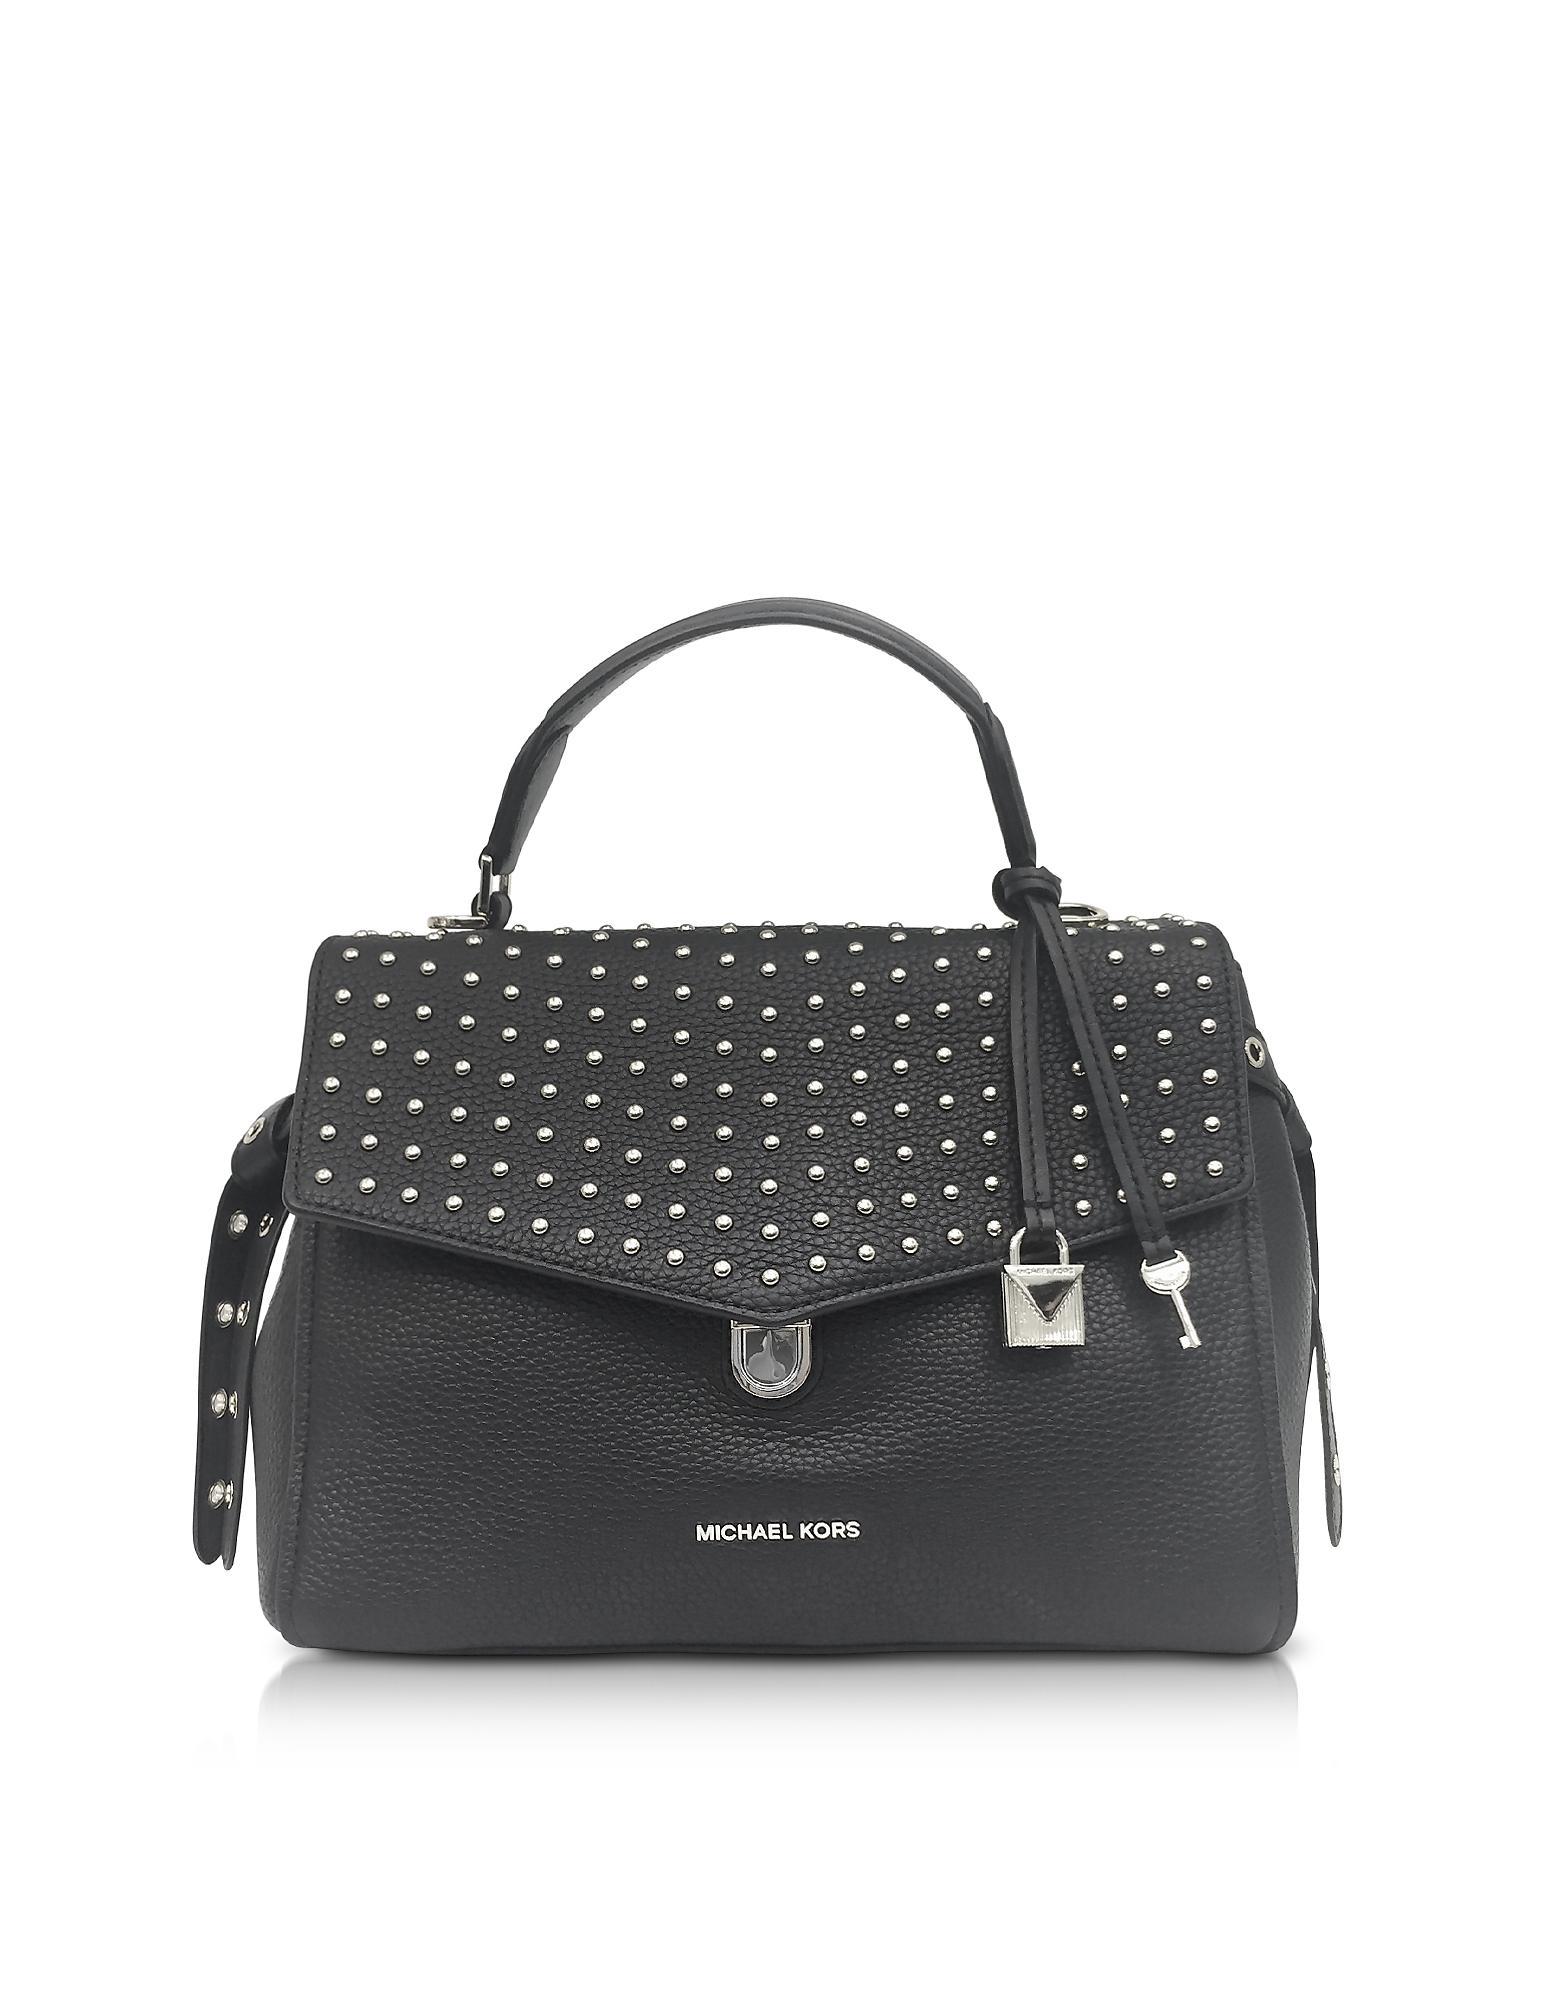 9d5cb69f5b Michael Kors Bristol Black Studded Leather Top Handle Satchel Bag in ...